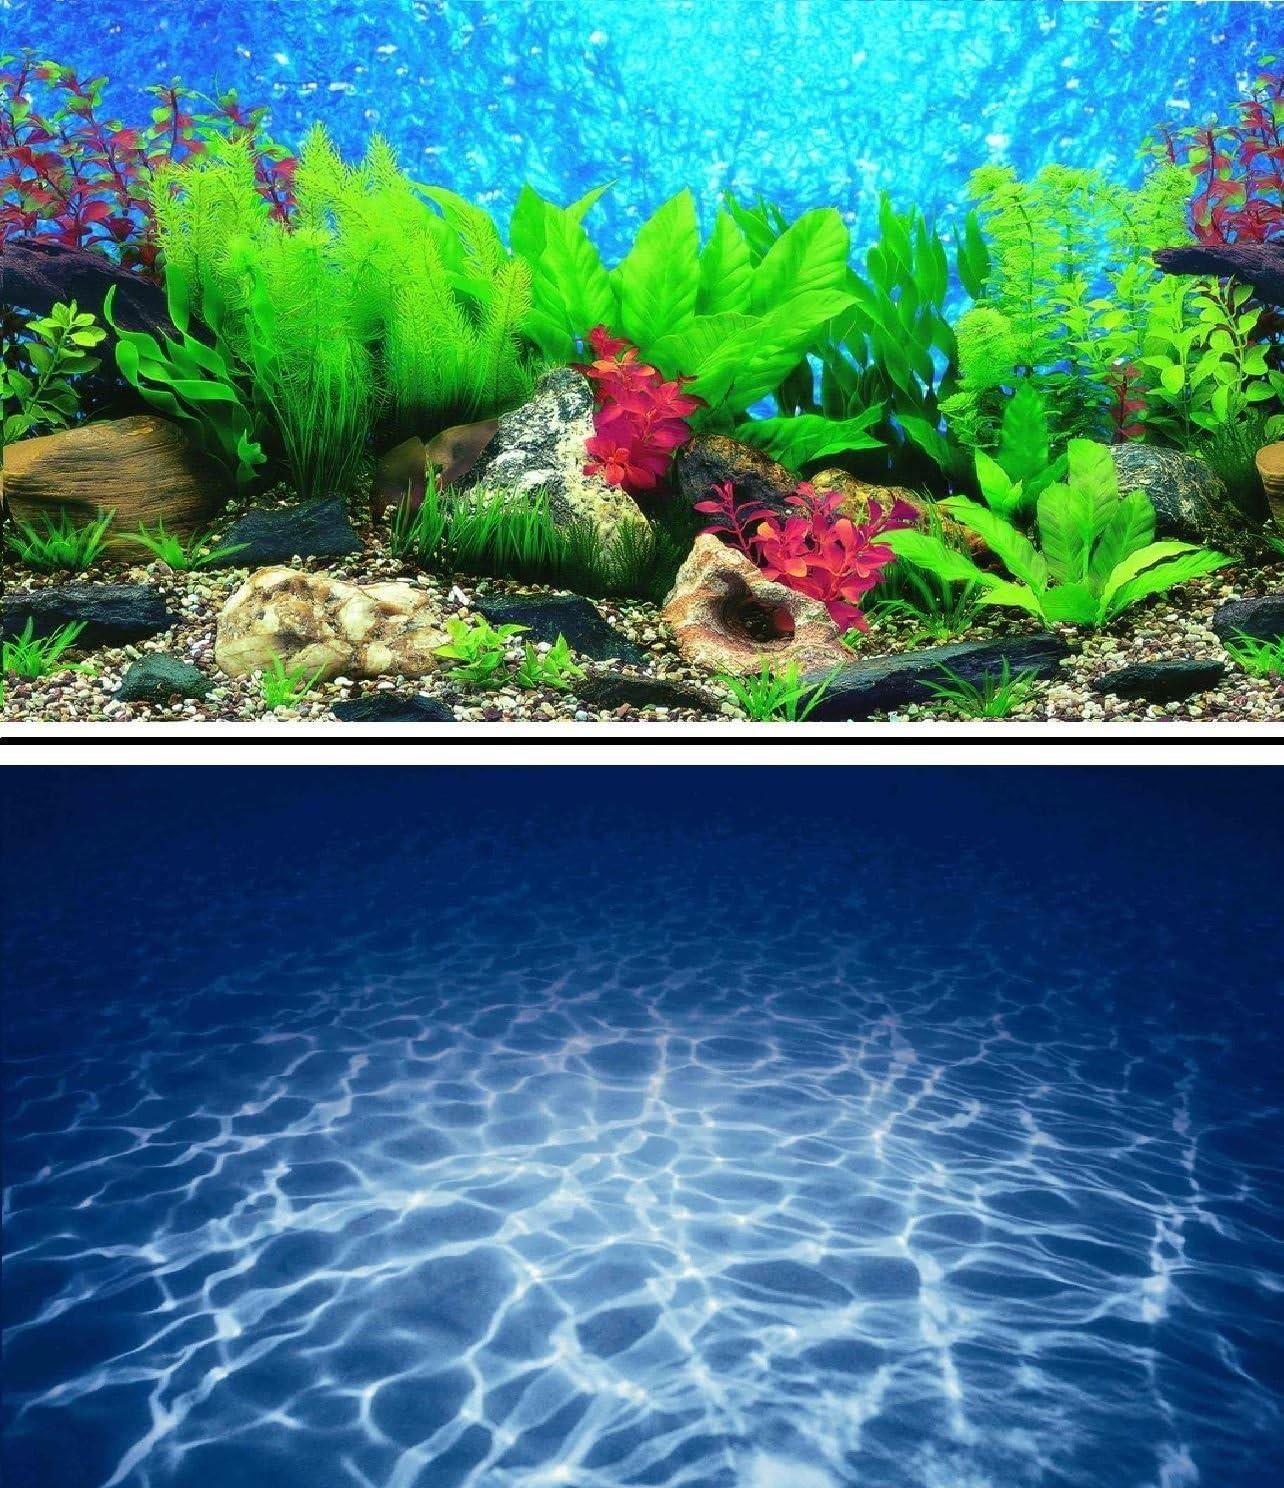 50cm Double Sided Aquarium Background Backdrop Fish Tank Reptile Vivarium Marine 19